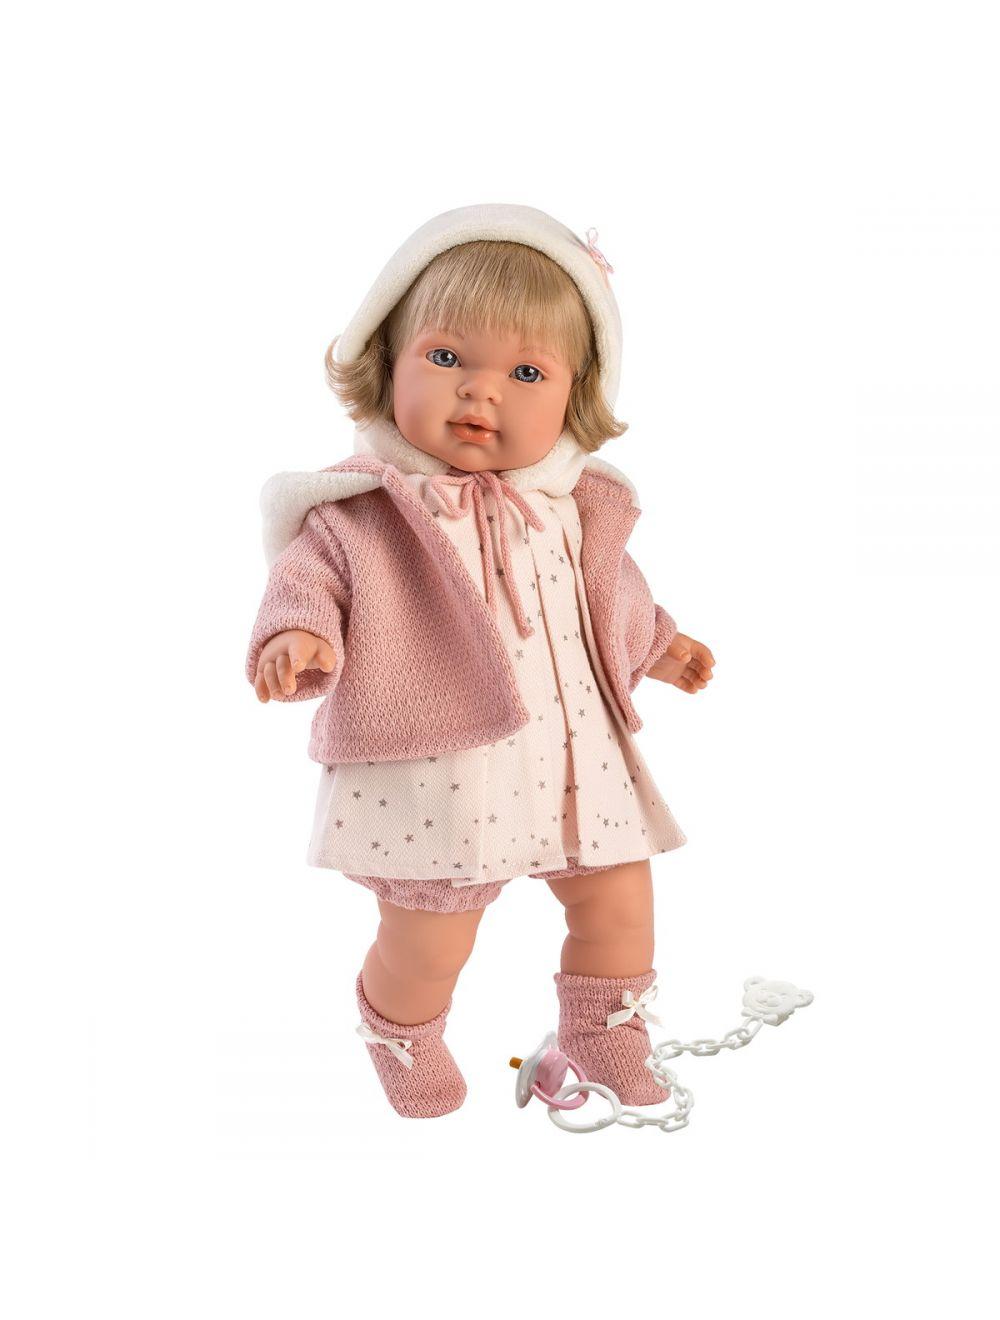 Llorens 42146 Lalka płacząca Carla 42 cm blondynka różowa bluza